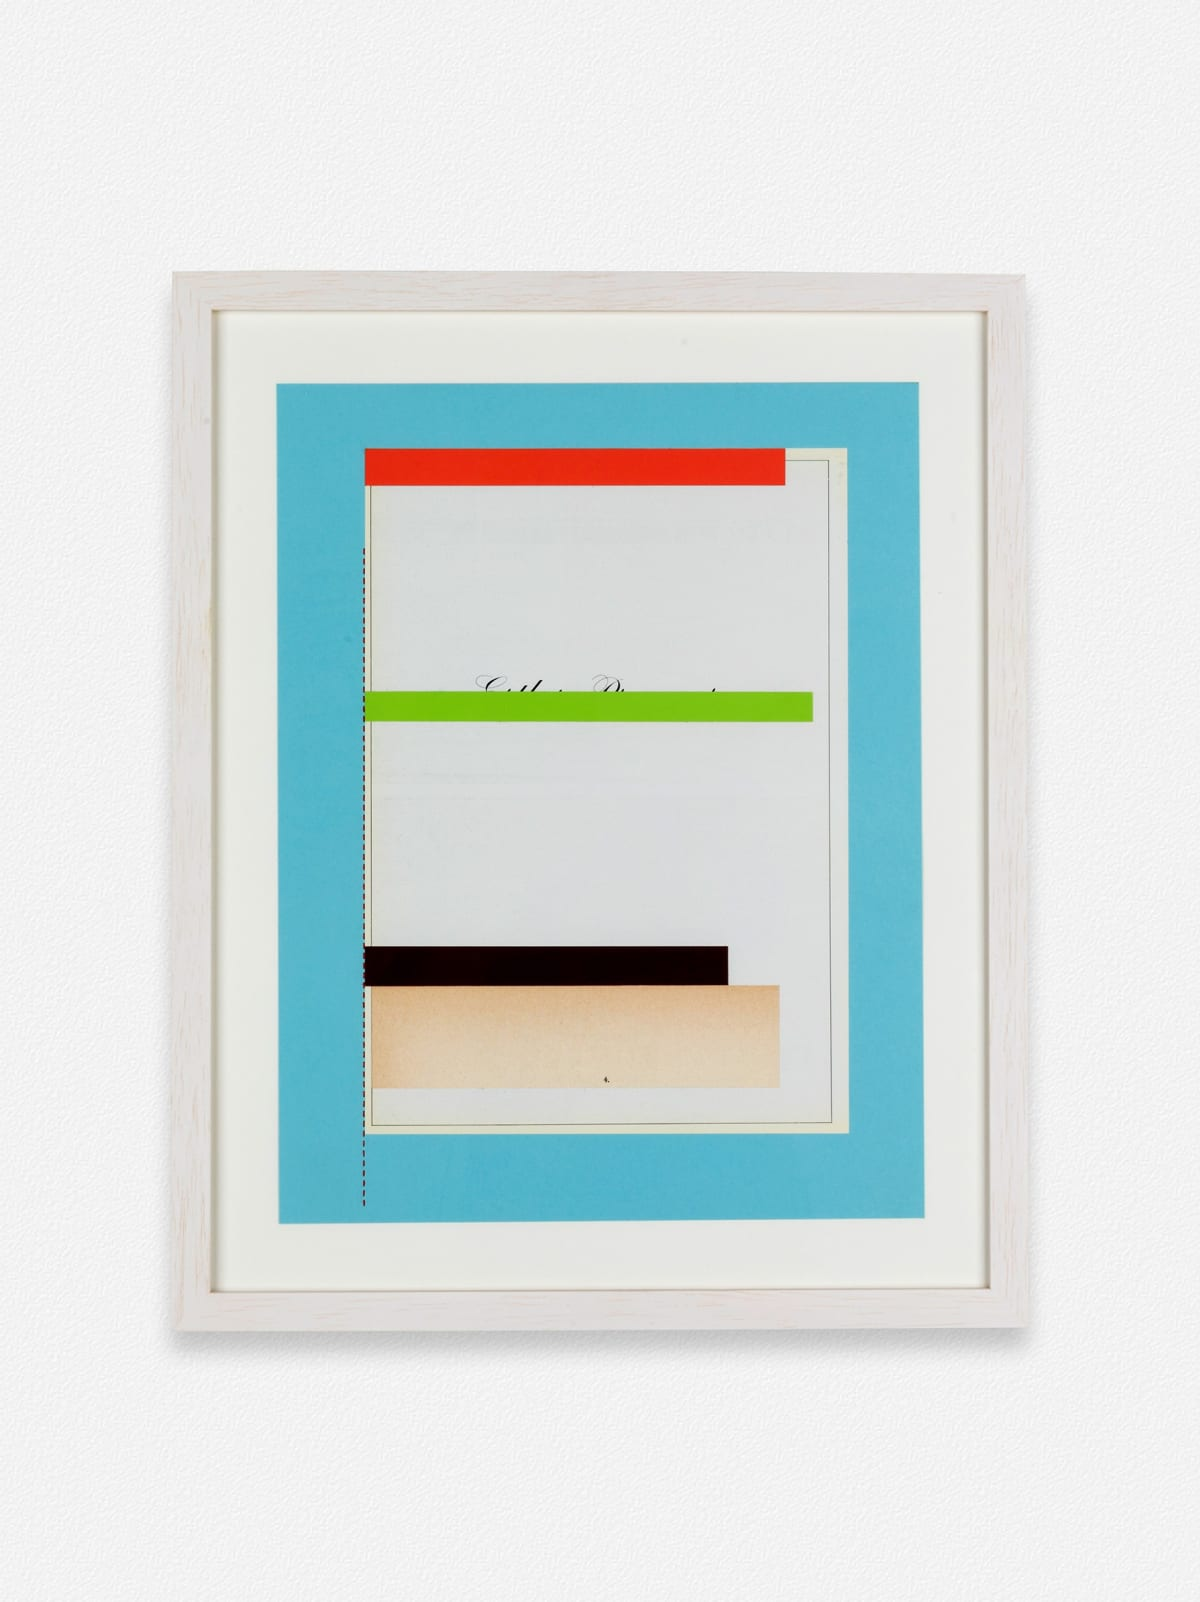 hans gallery, dan devening, artist, collage